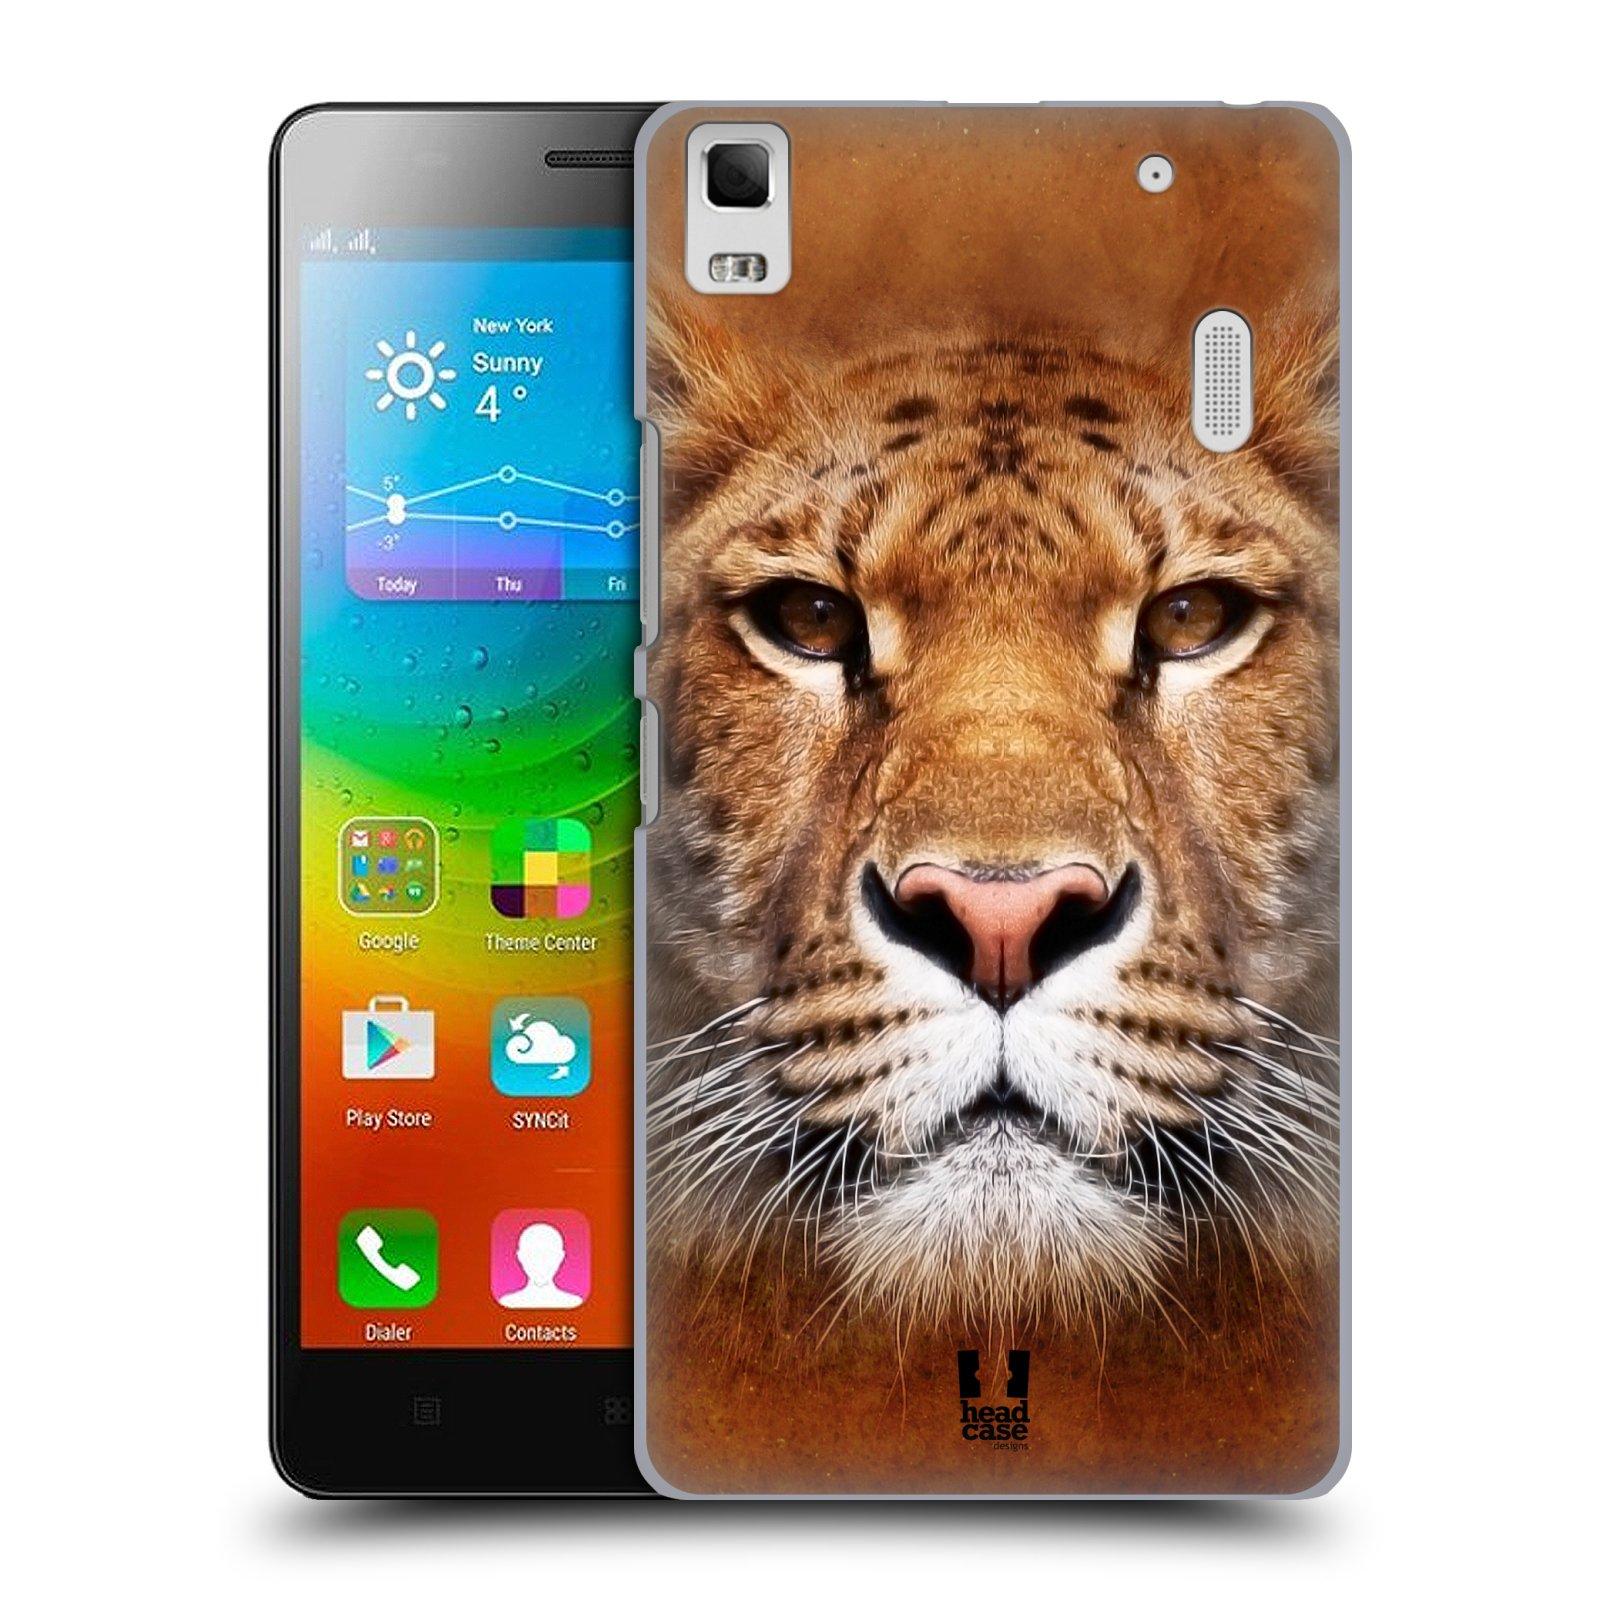 HEAD CASE pevný plastový obal na mobil LENOVO A7000 / A7000 DUAL / K3 NOTE vzor Zvířecí tváře Sibiřský tygr